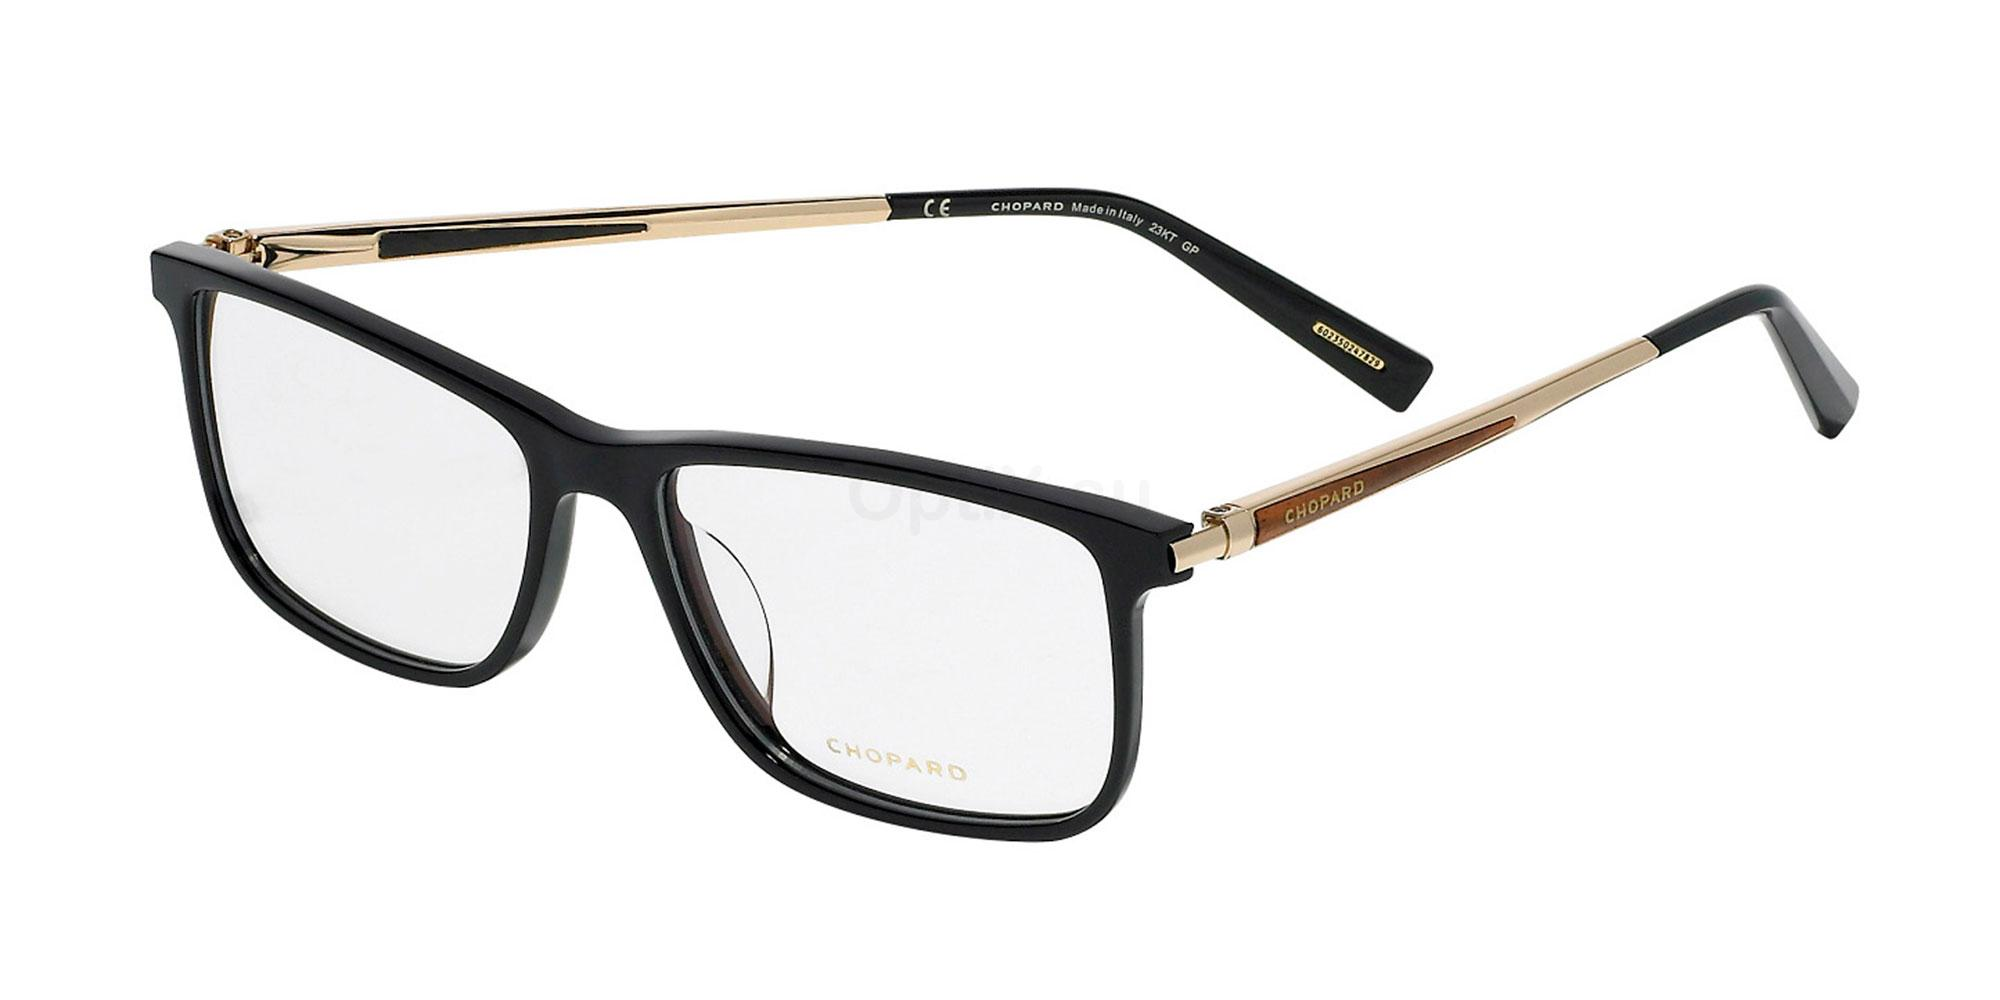 0700 VCH269 Glasses, Chopard